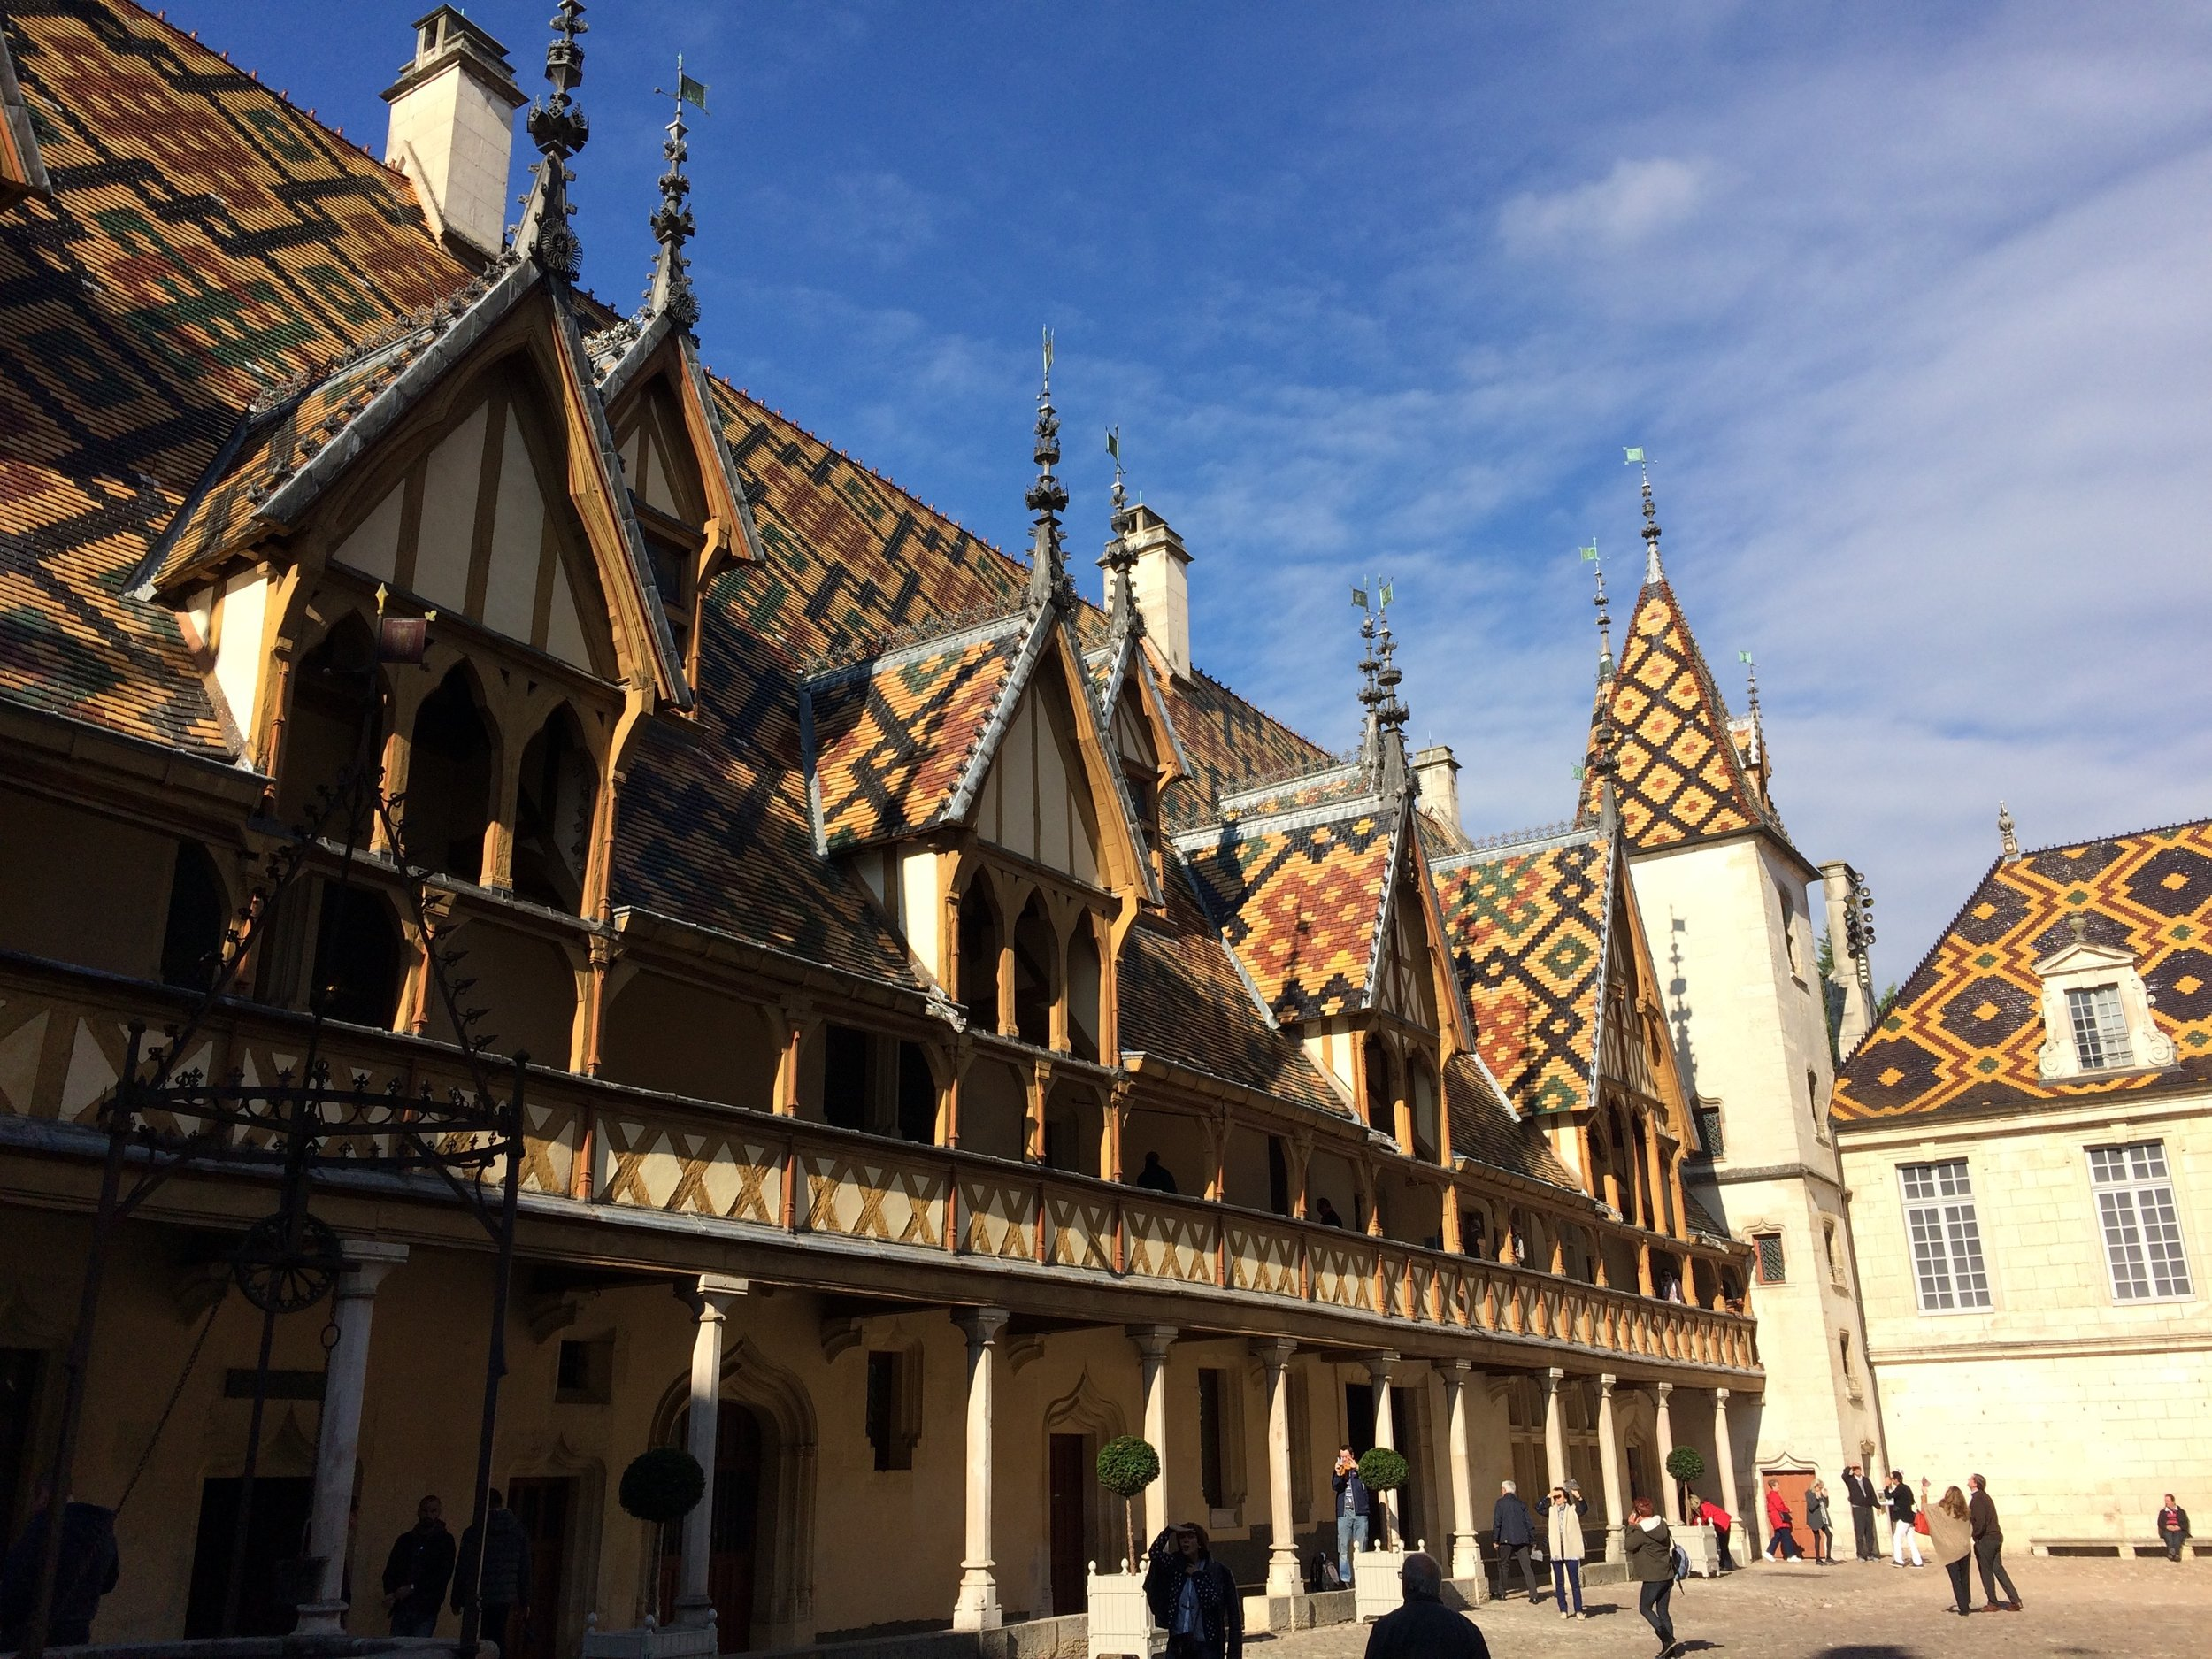 The stunning Hôtel Dieu in Beaune, built in 1443